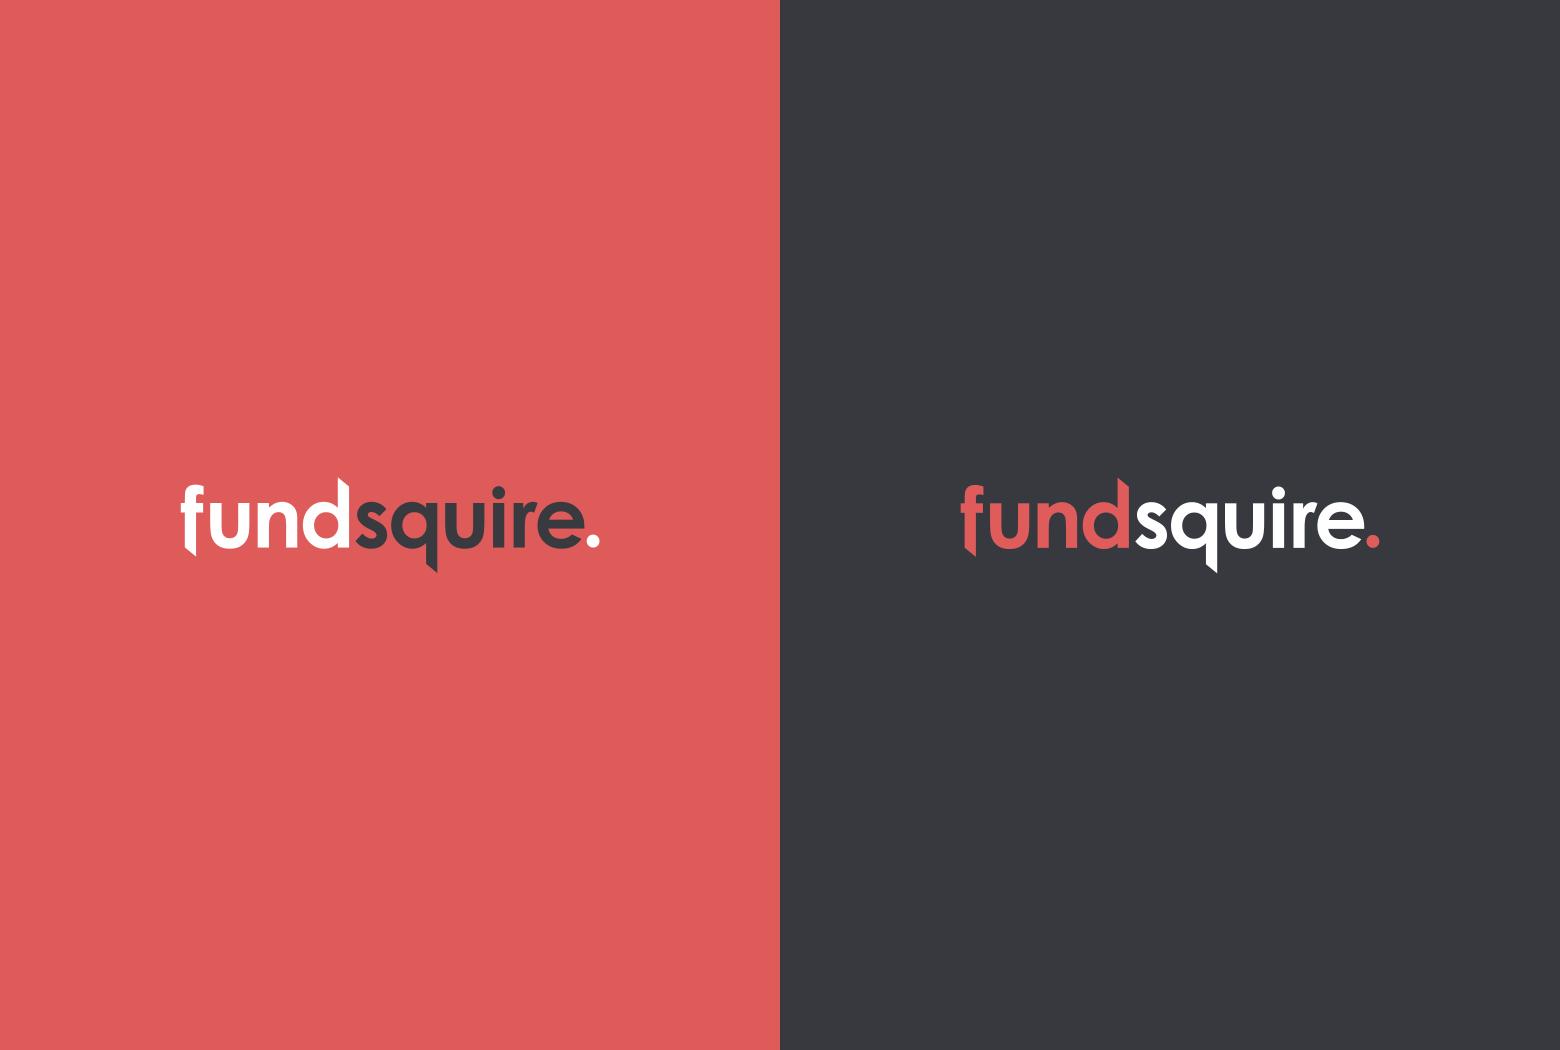 Nectar-&-Co-Fundsquire-Financial Services Branding Logo-Design.jpg